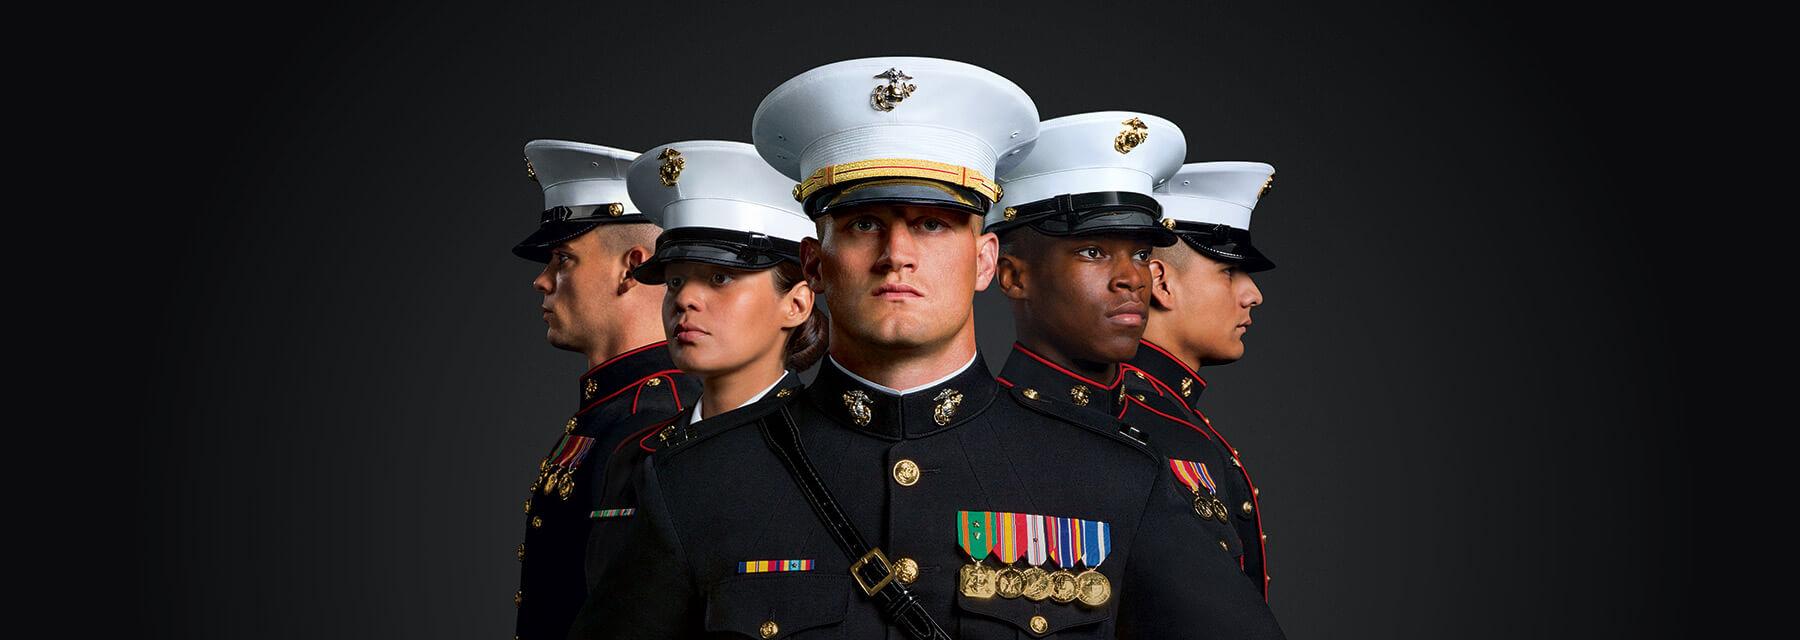 Marine Corps Uniforms, Ranks, & Symbols | Marines